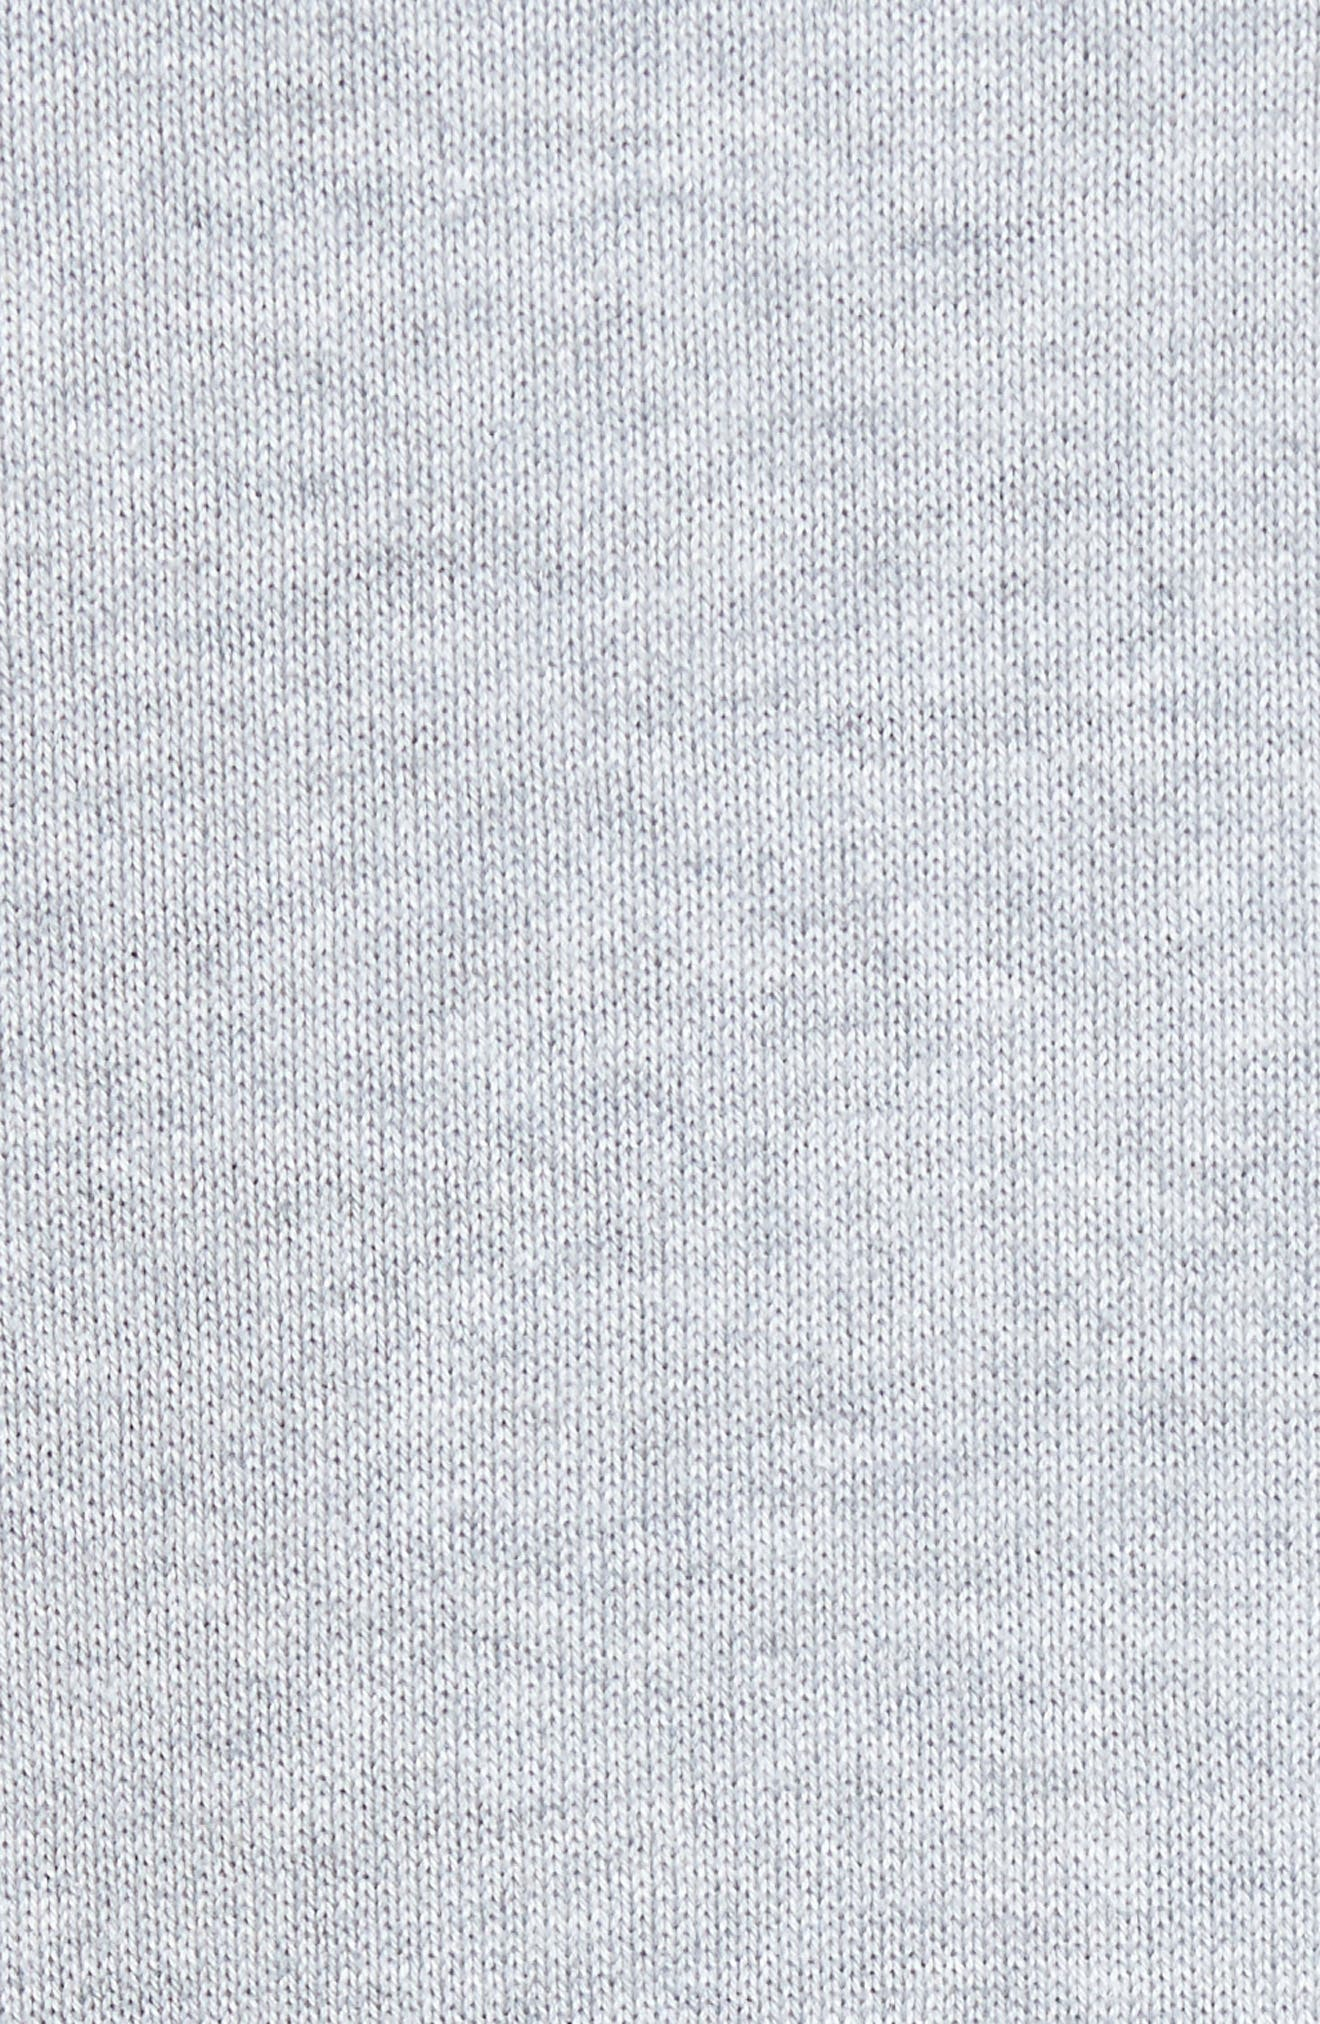 Piqué Jersey V-Neck Sweater,                             Alternate thumbnail 5, color,                             078